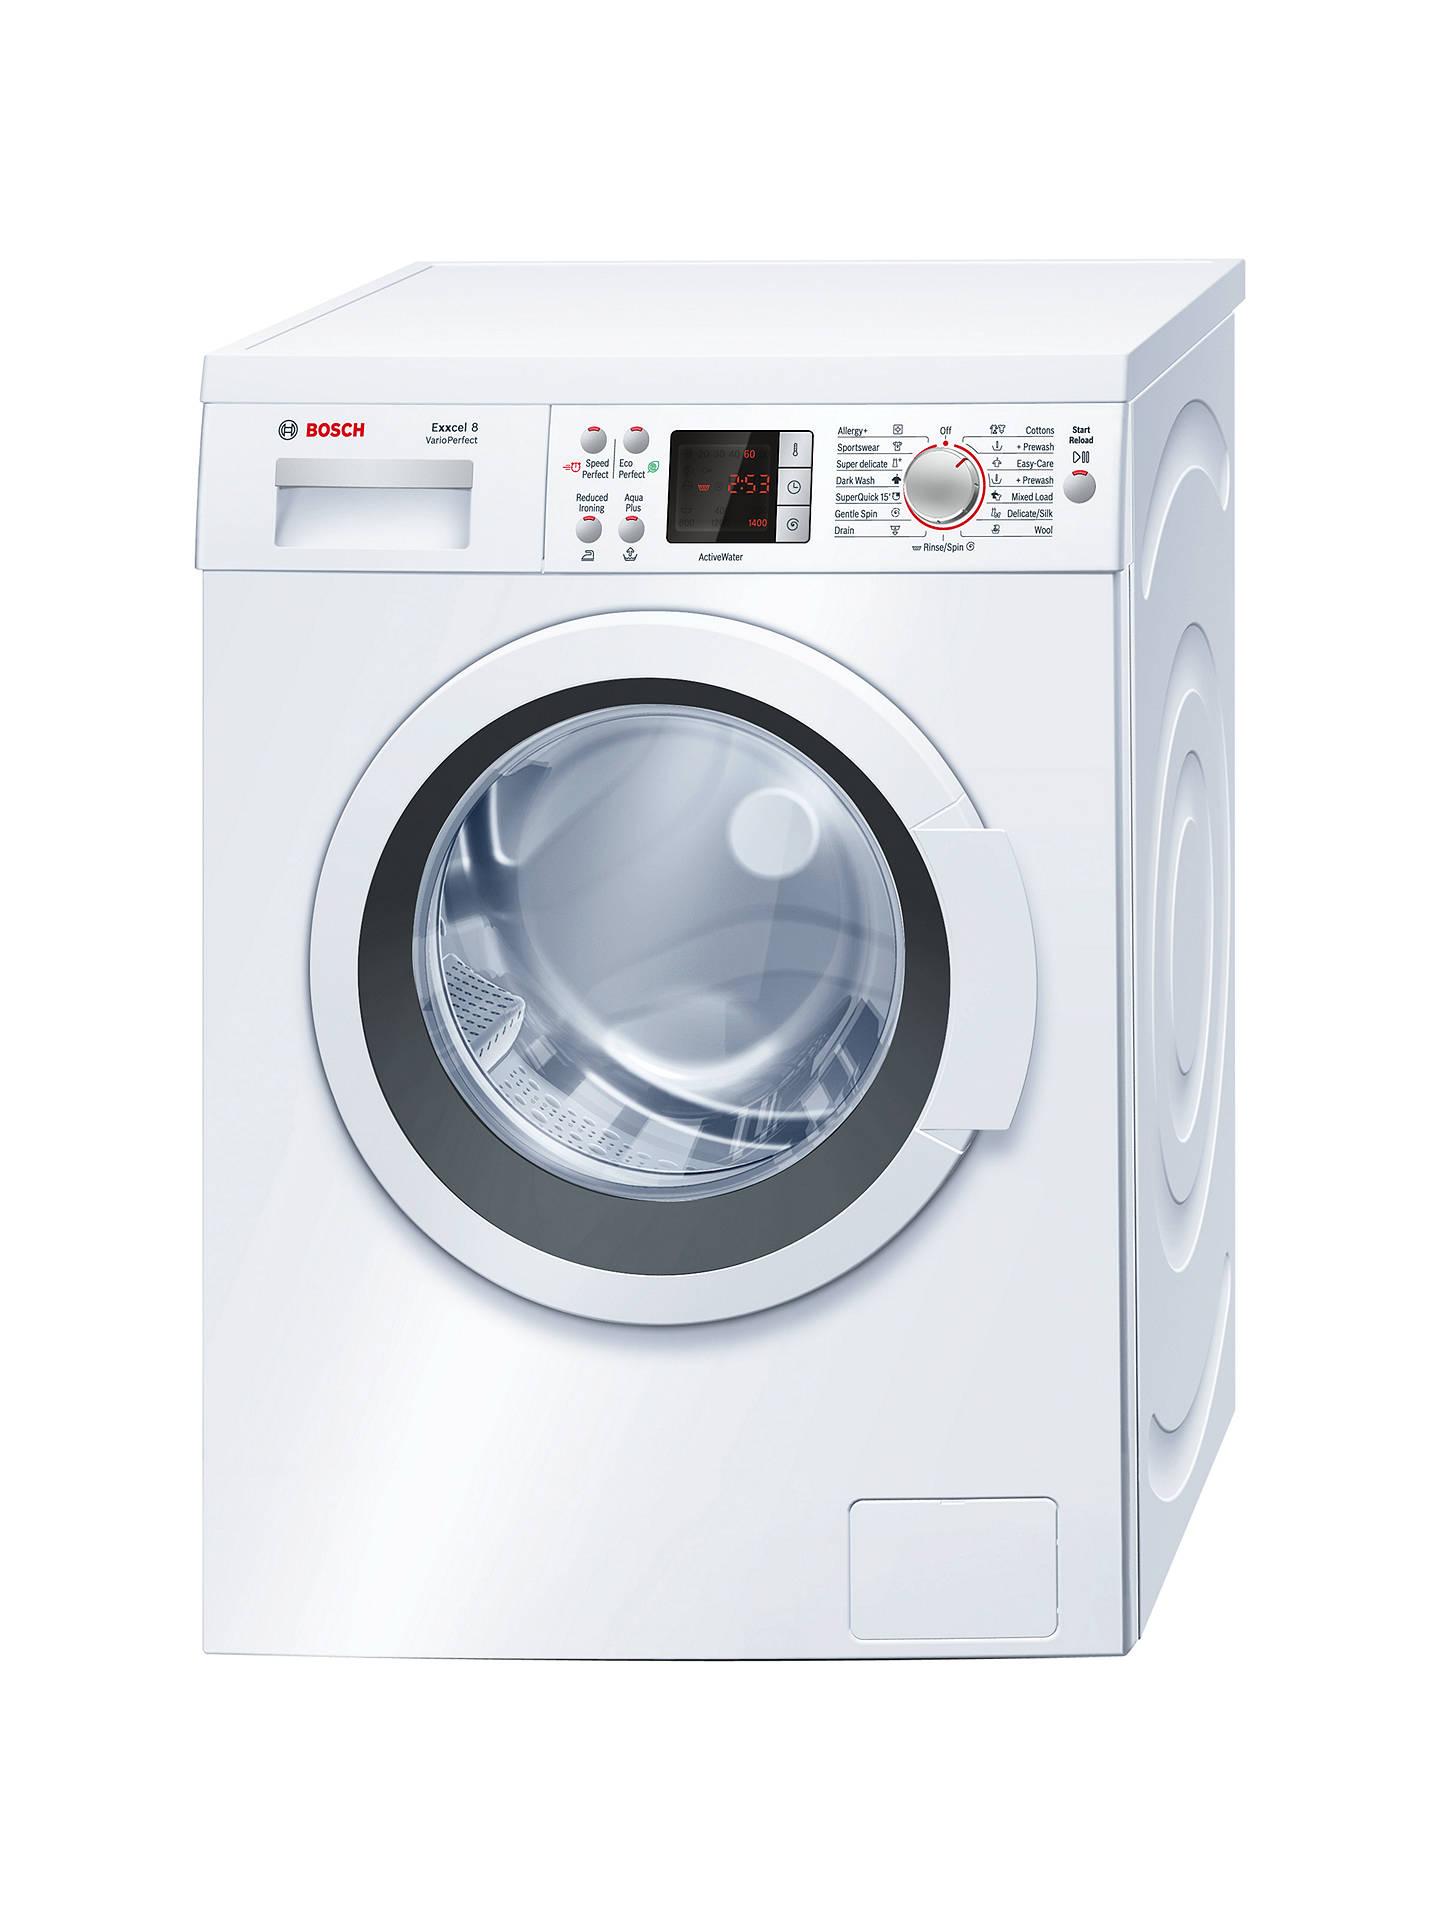 Bosch Ecel Waq28461gb Freestanding Washing Machine 8kg Load A Energy Rating 1400rpm Spin